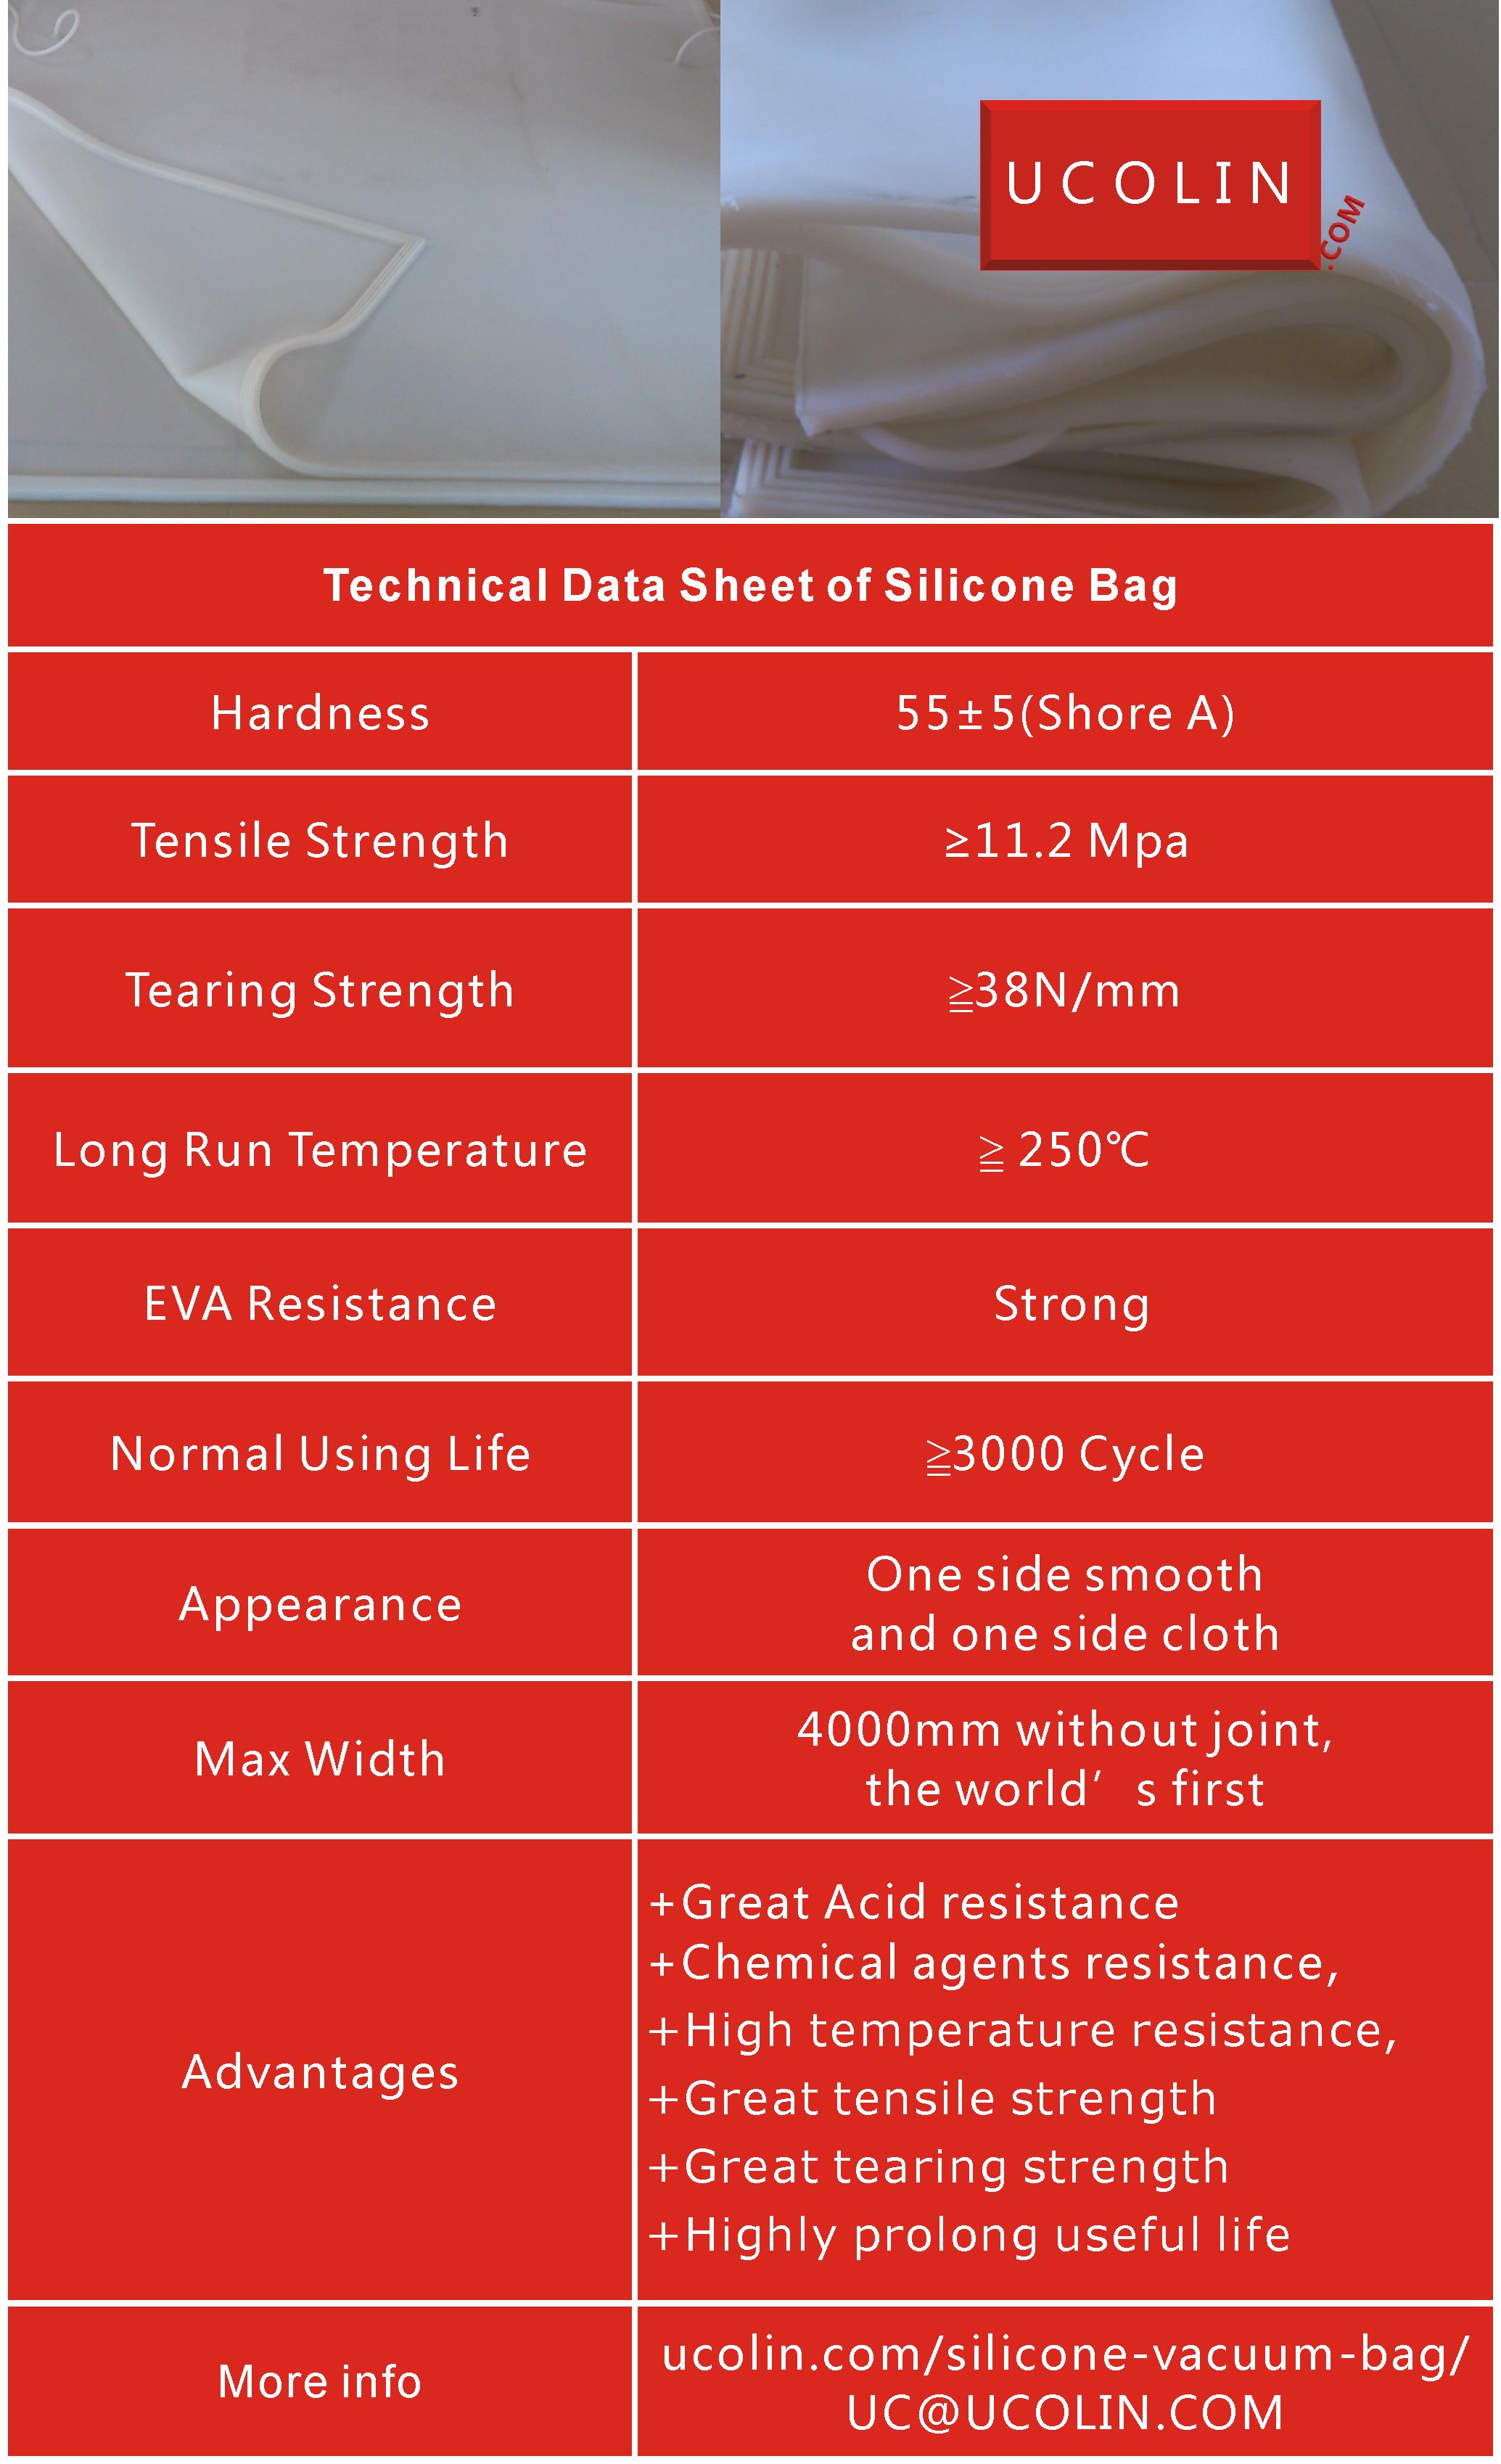 Silicone vacuum bag technical datasheet for laminated glass furnace